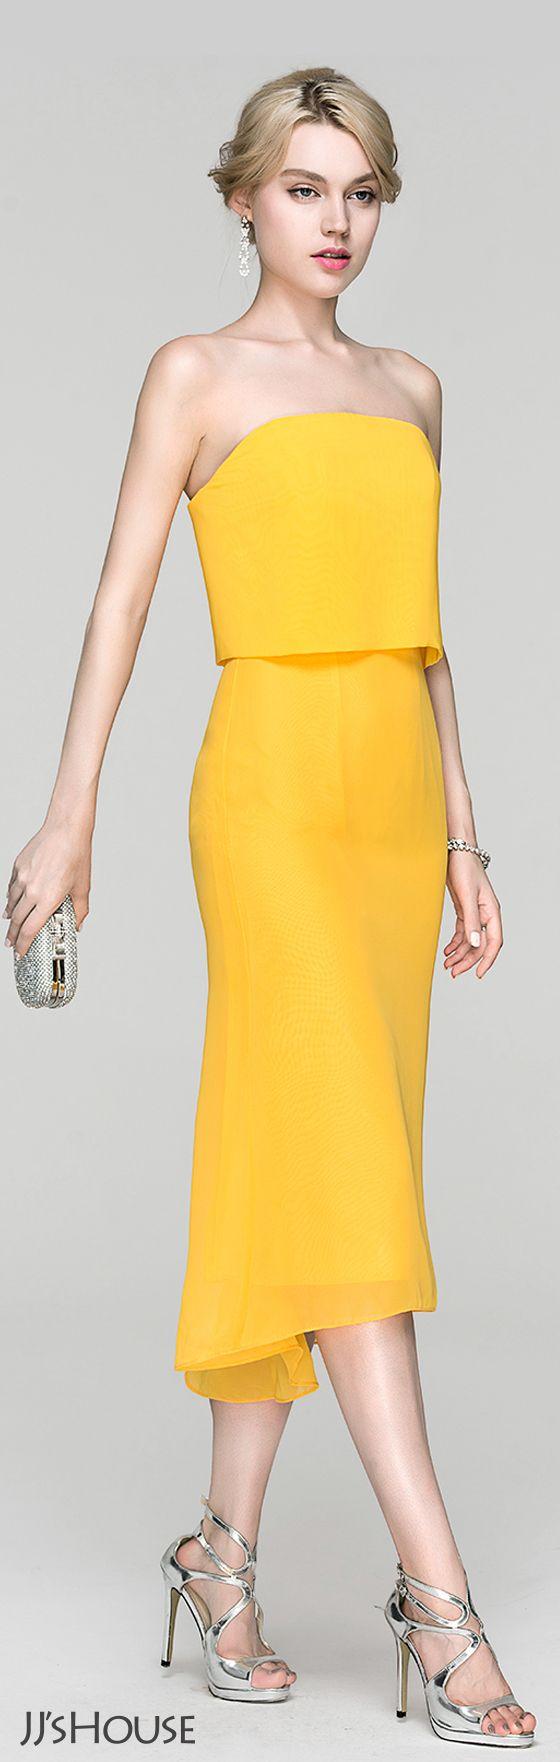 Tube or column silhouette. #JJsHouse #Cocktail